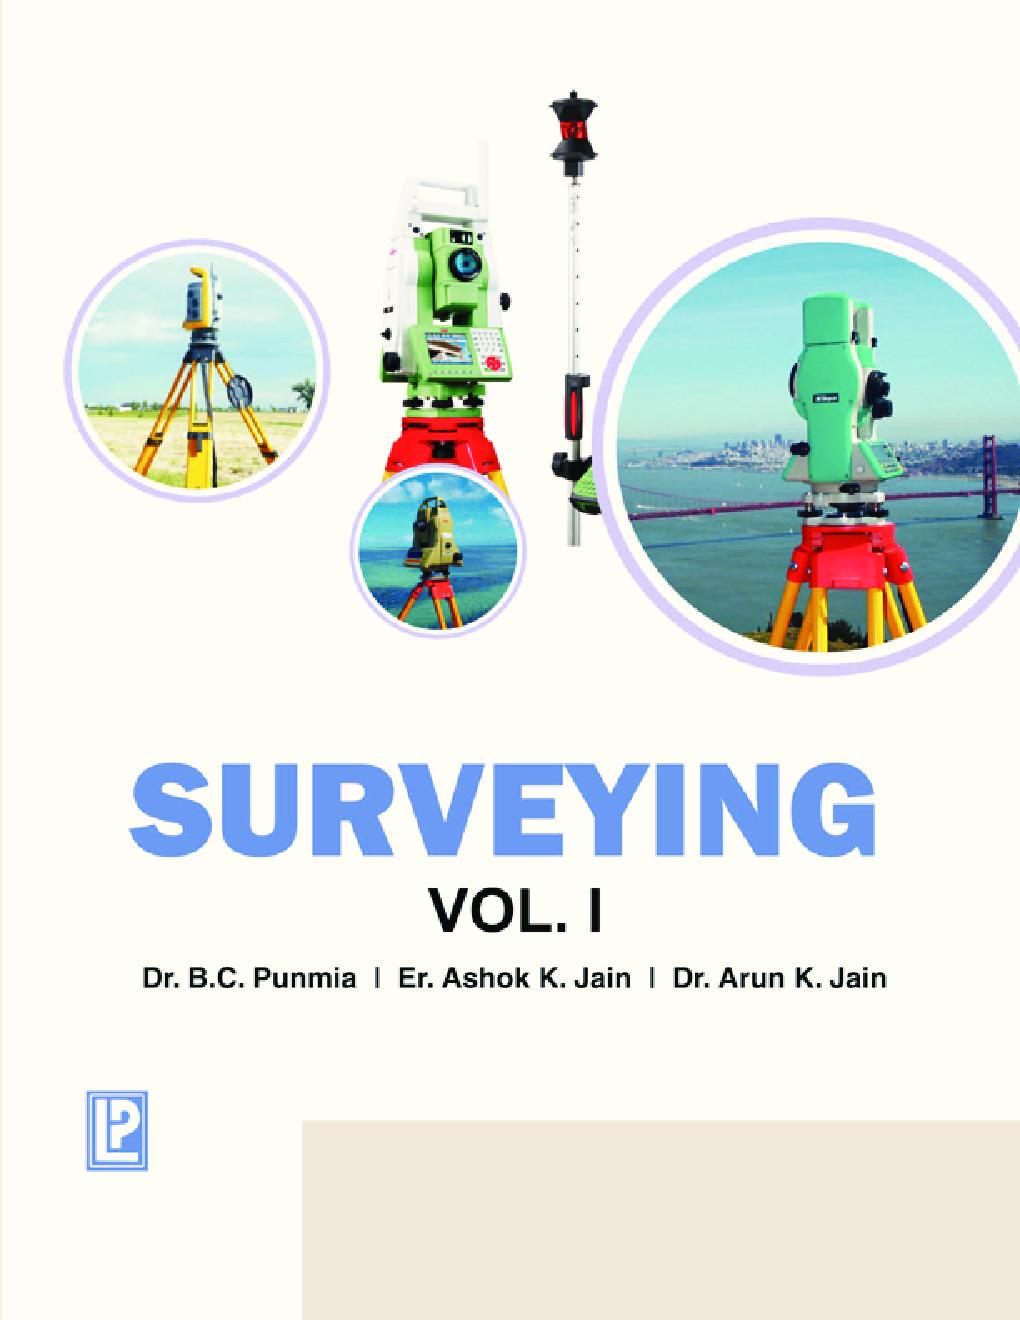 Surveying Vol. 1 - Page 1